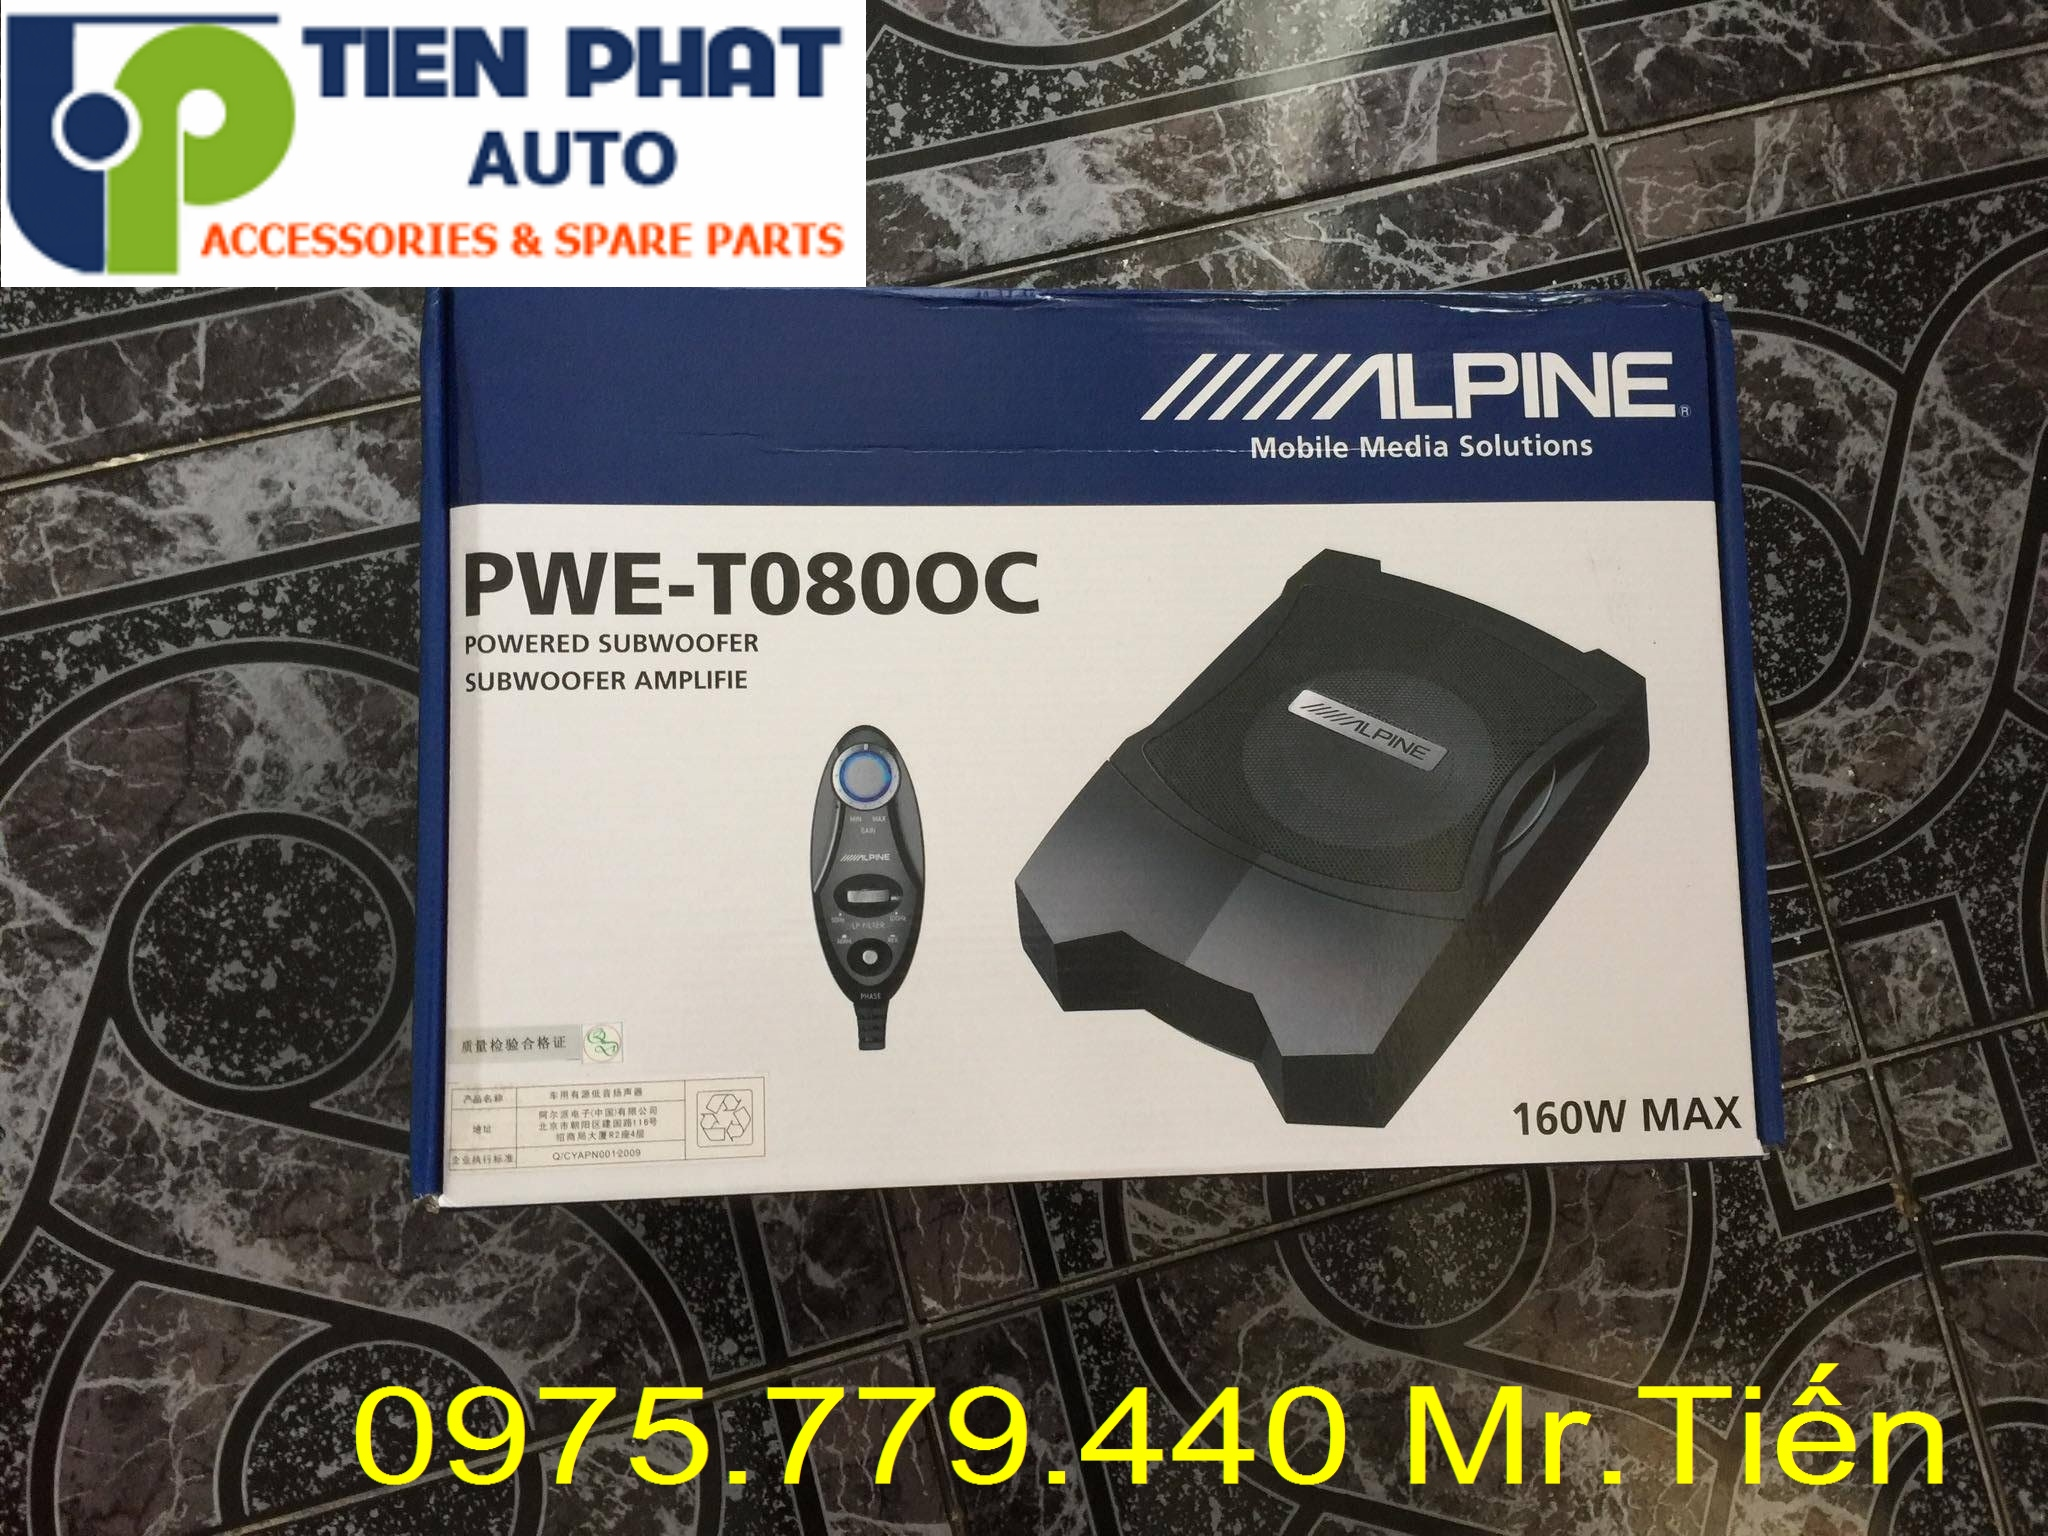 Lắp Loa sub Alpine PWE-T0800C cho Mazda 6 Lắp Đặt Tận Nơi